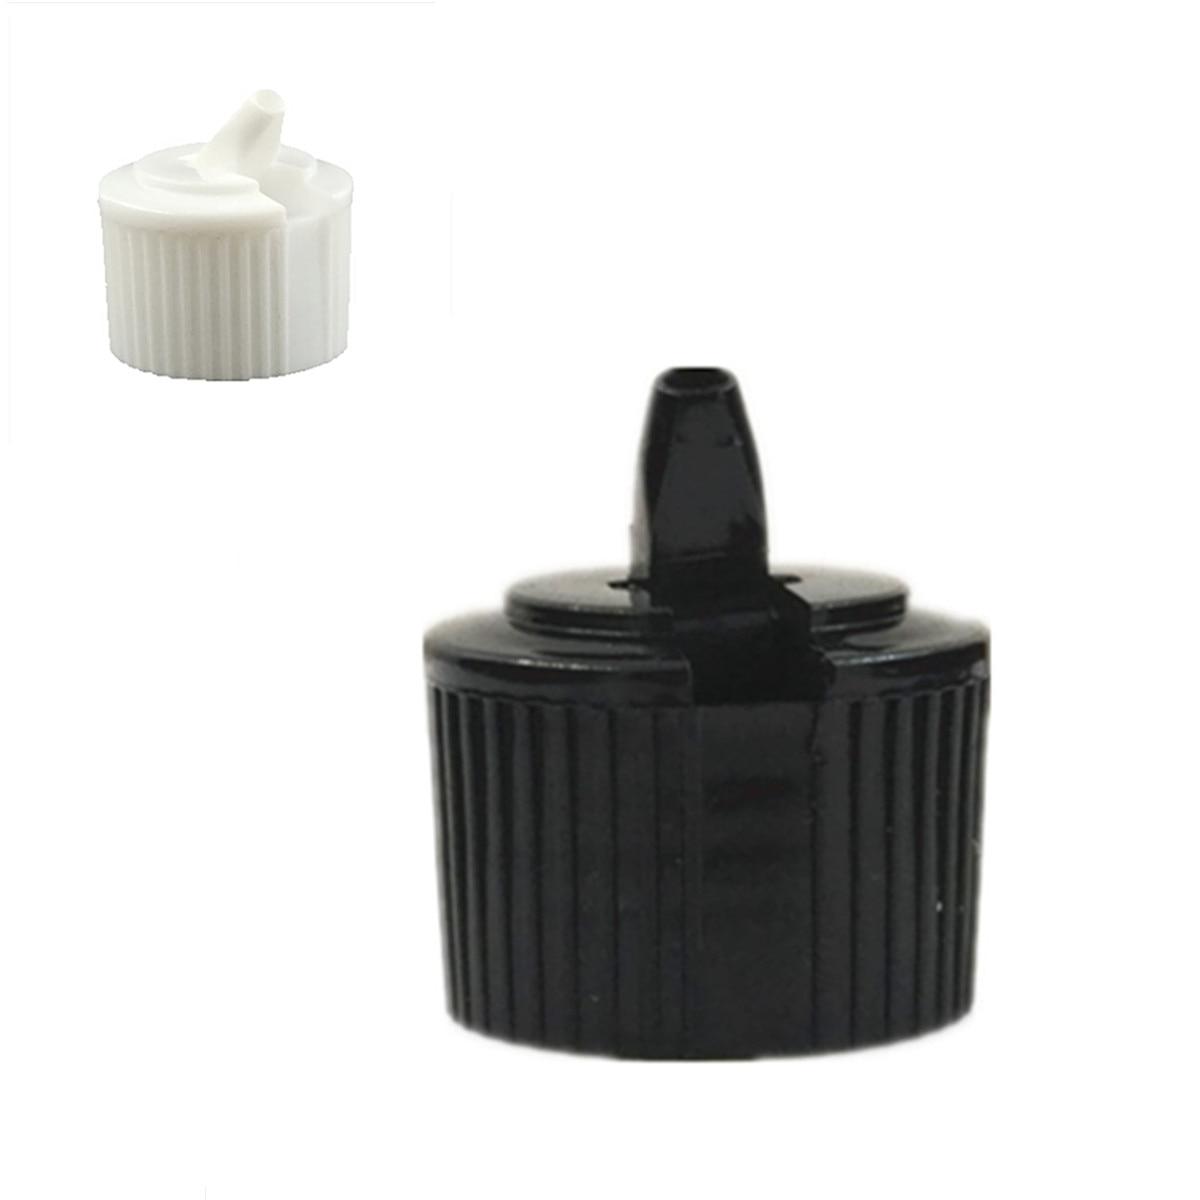 24-410 Ribbed Side Plastic Spout Top Caps Dispensing TURRET Cap 10pc